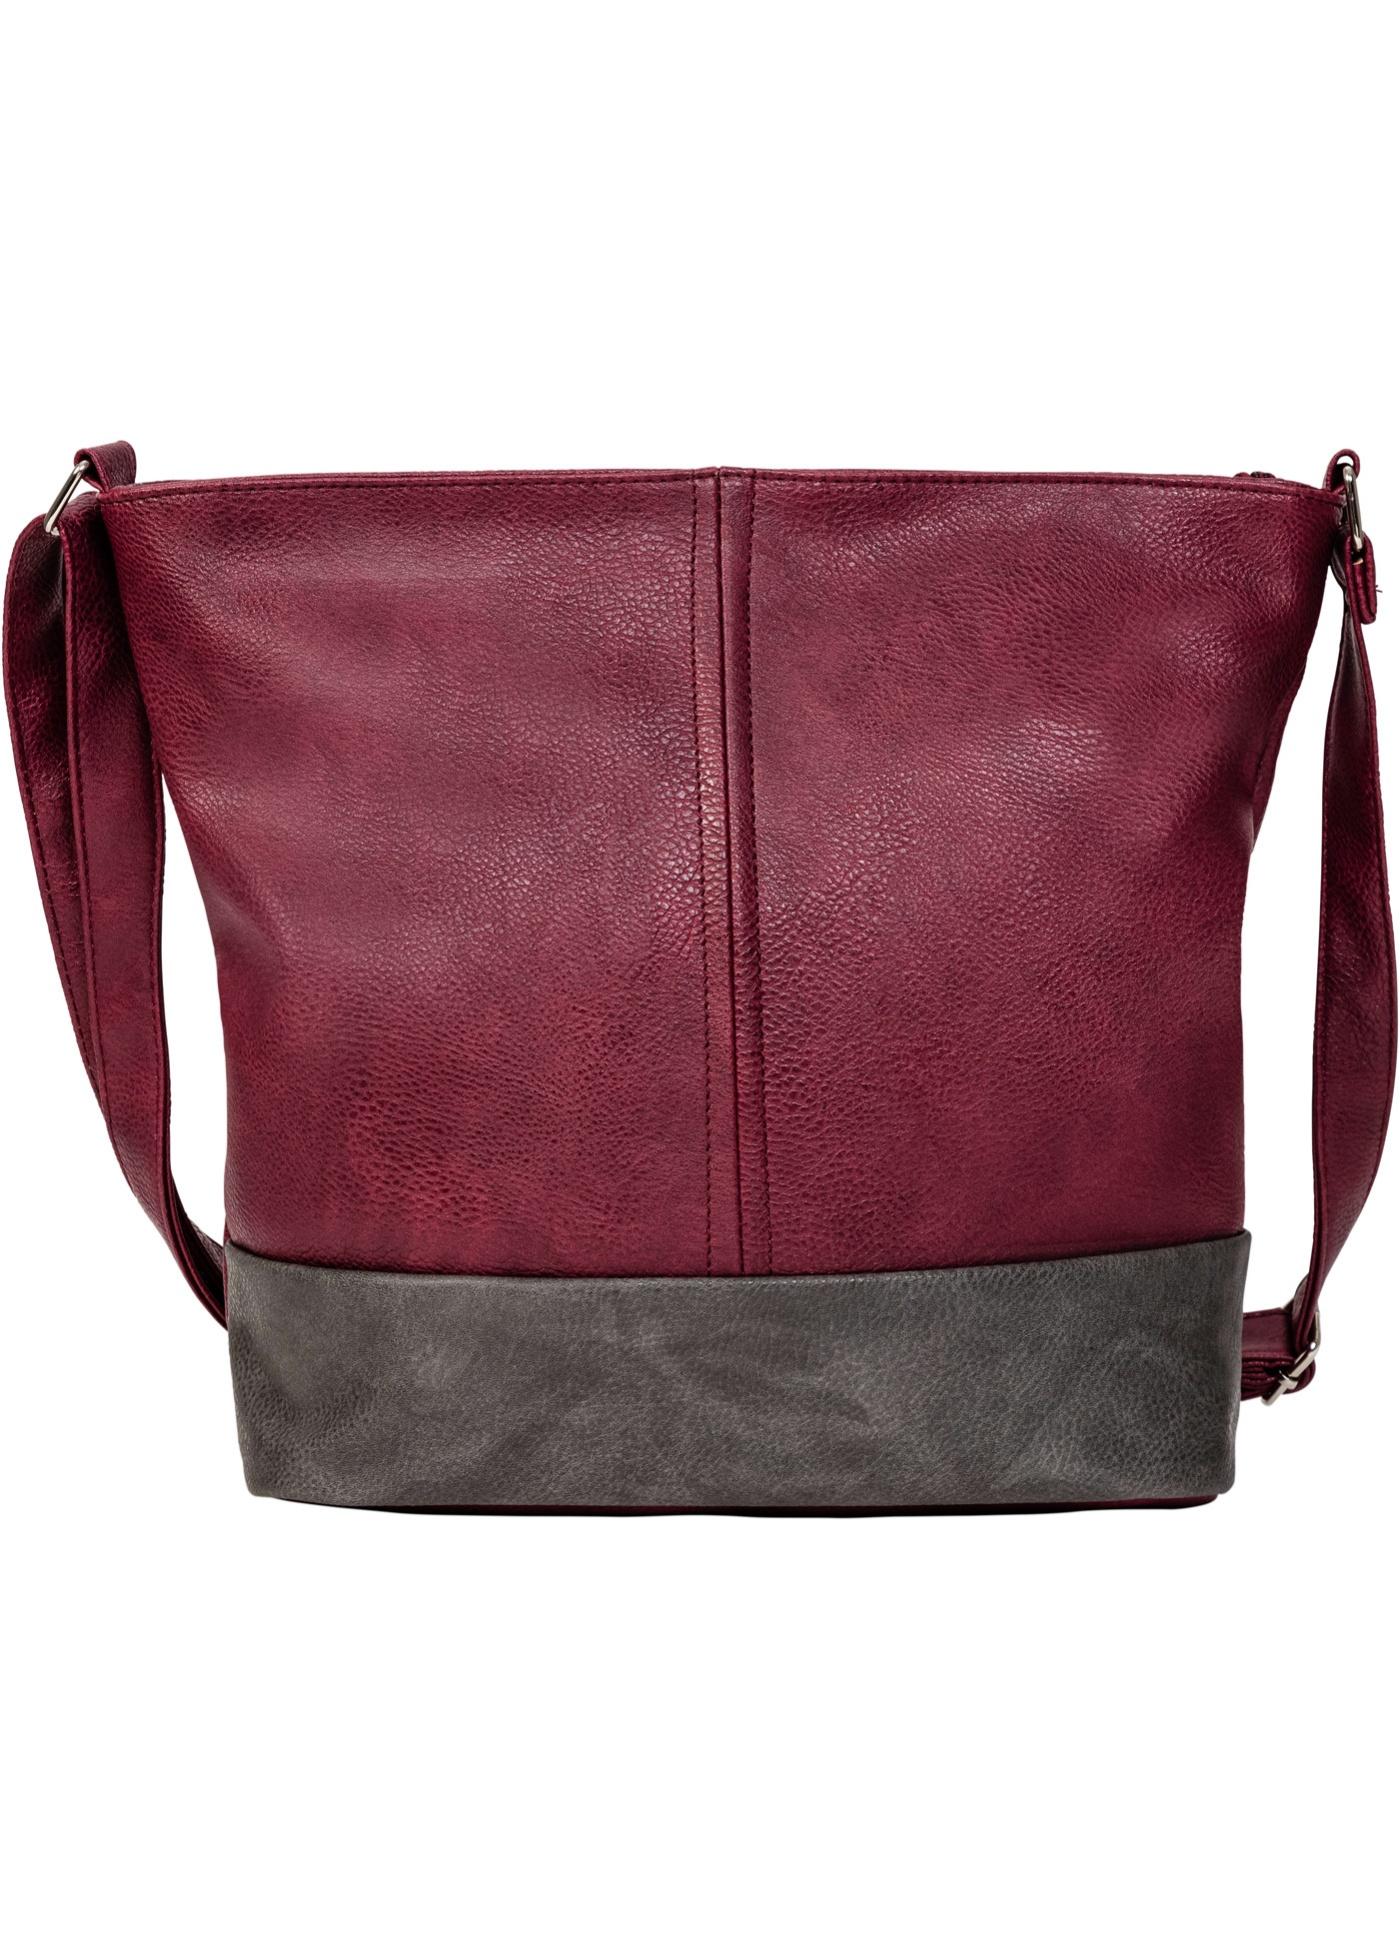 9b33ea5e1a Pekna cervena kabelka levně | Mobilmania zboží